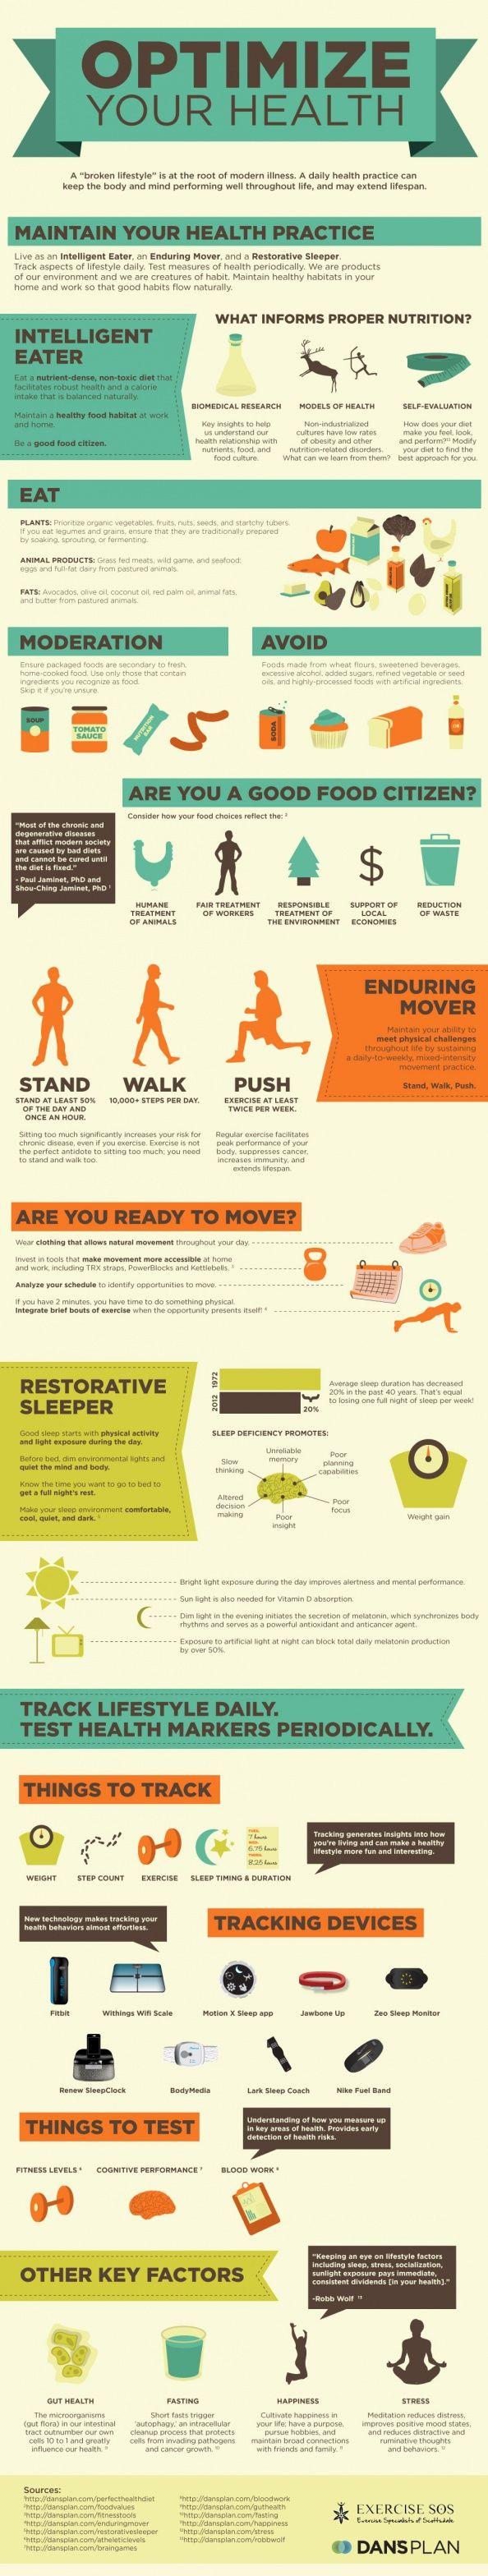 Broken Lifestyle Optimize Your Health Infographic via